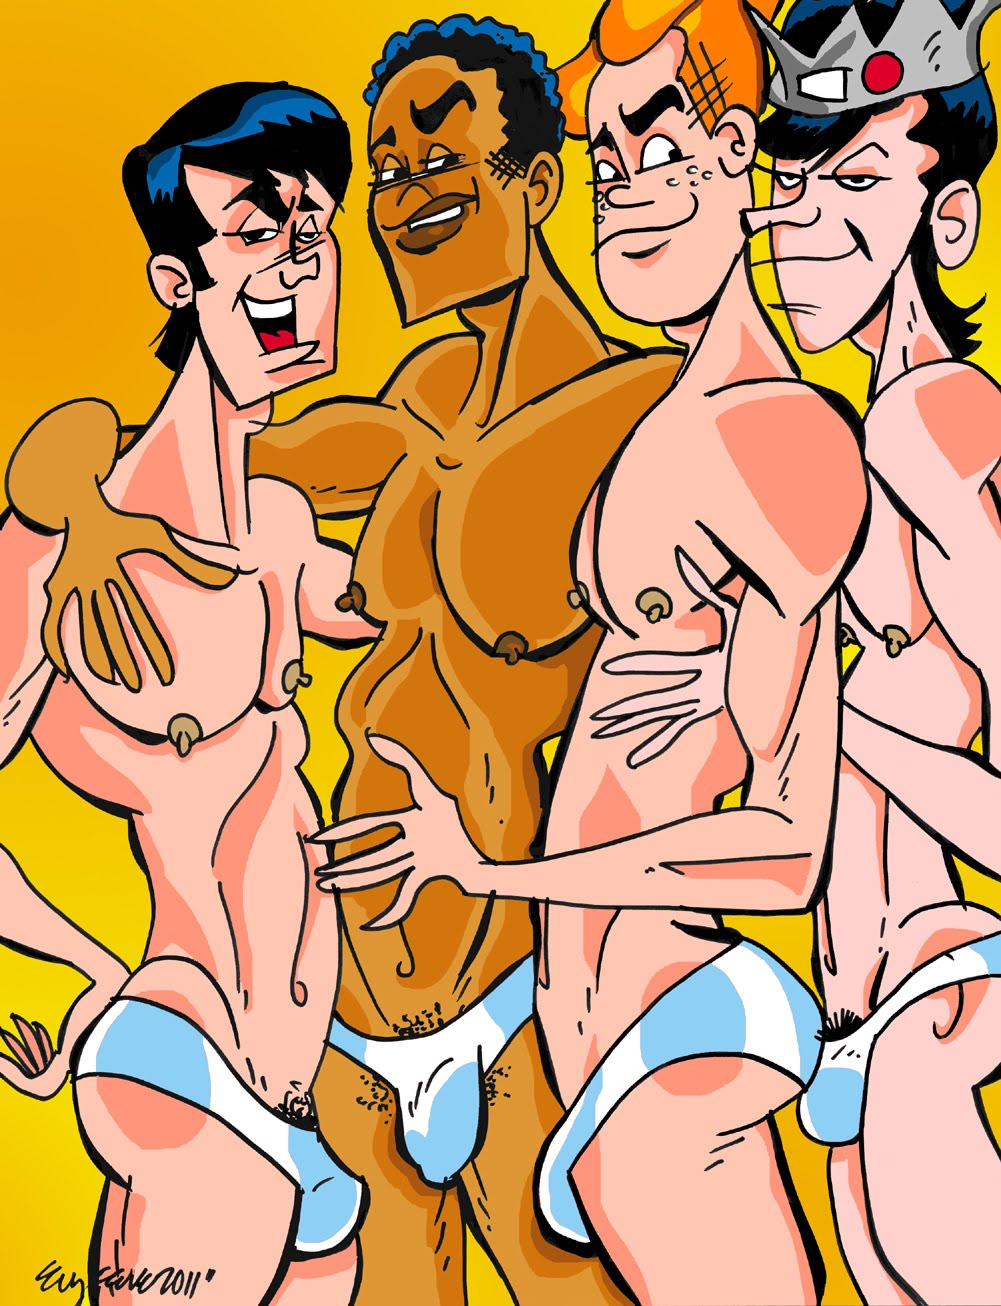 Archie comics parody nude porn pictures